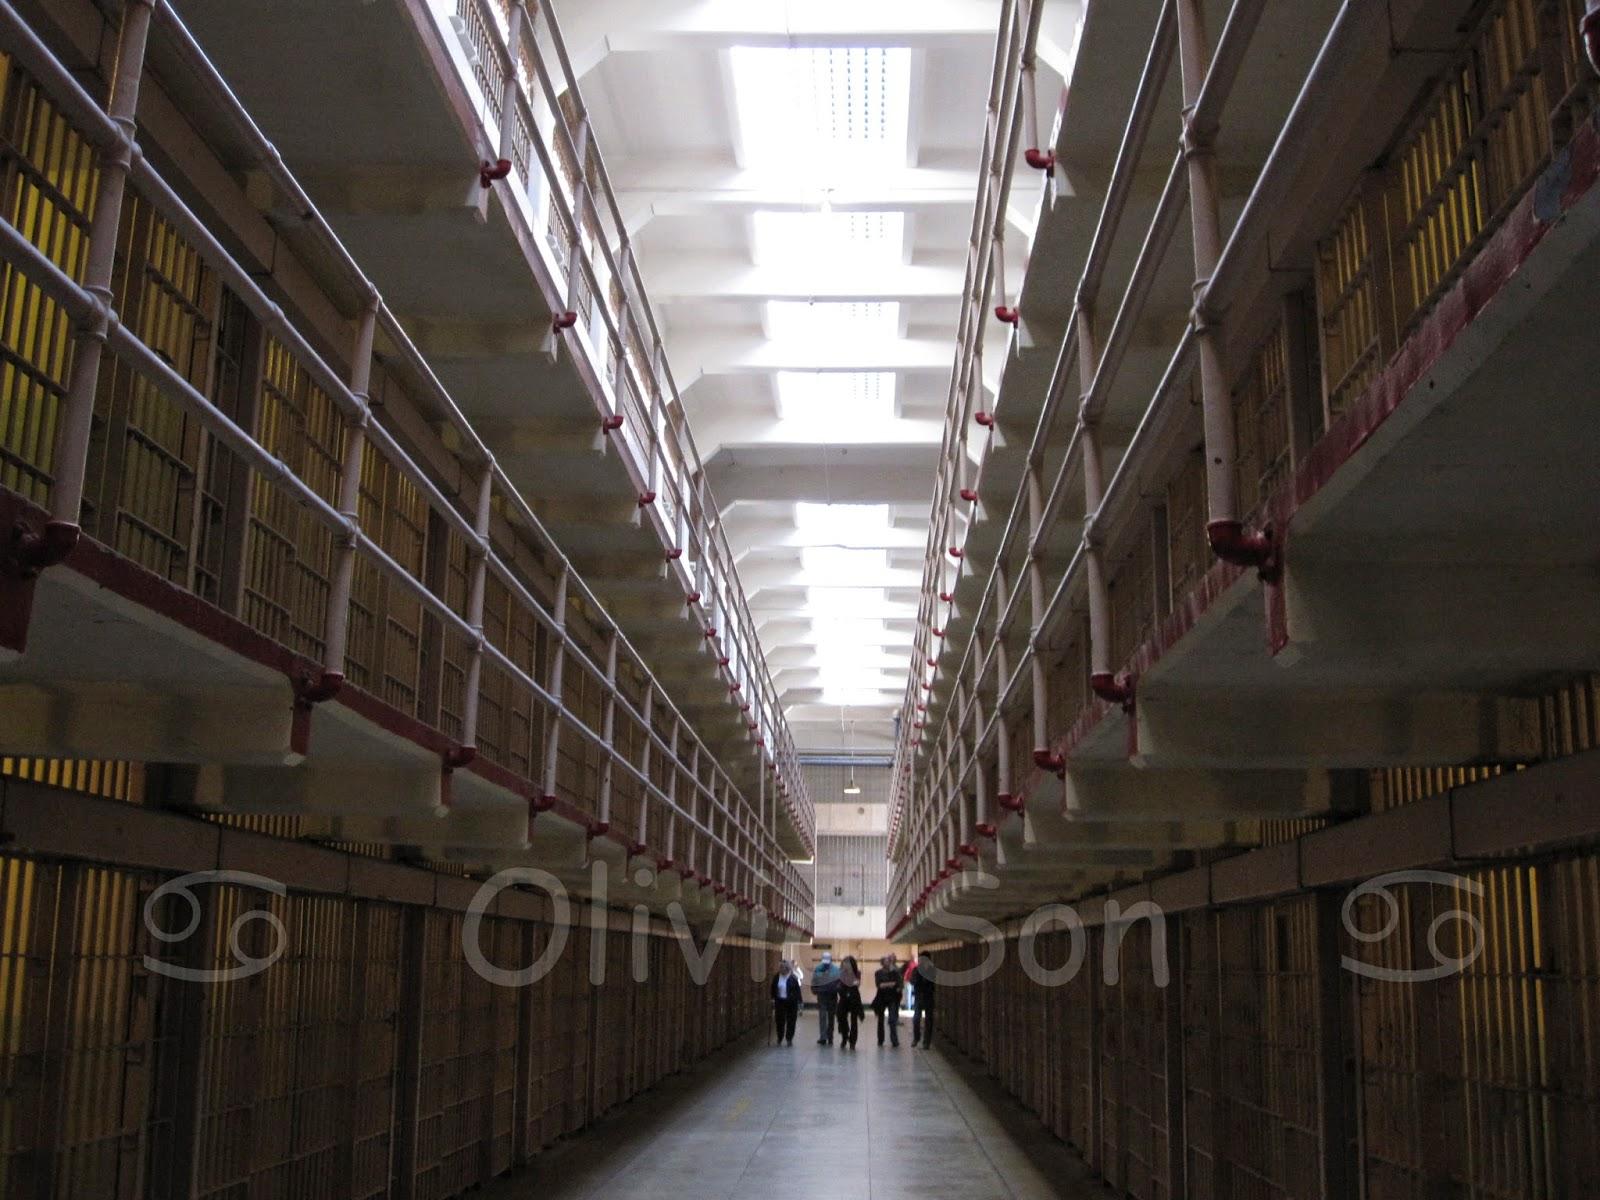 alcatraz san francisco, californie, usa